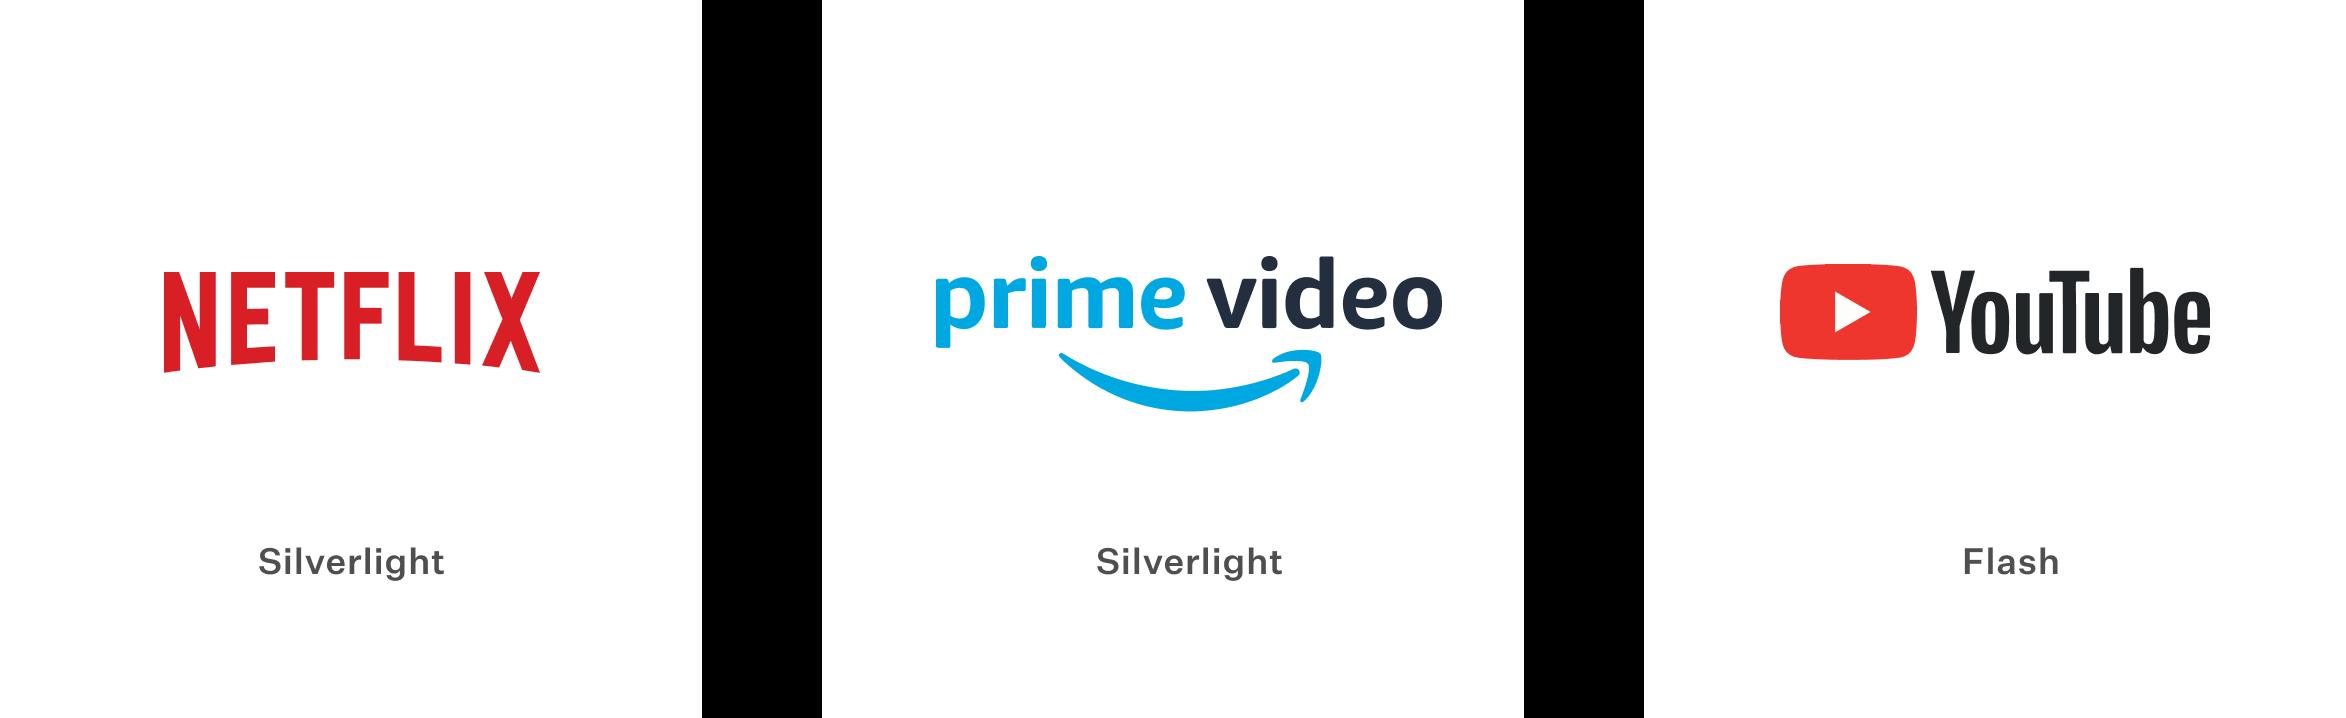 Platforms using Silverlight